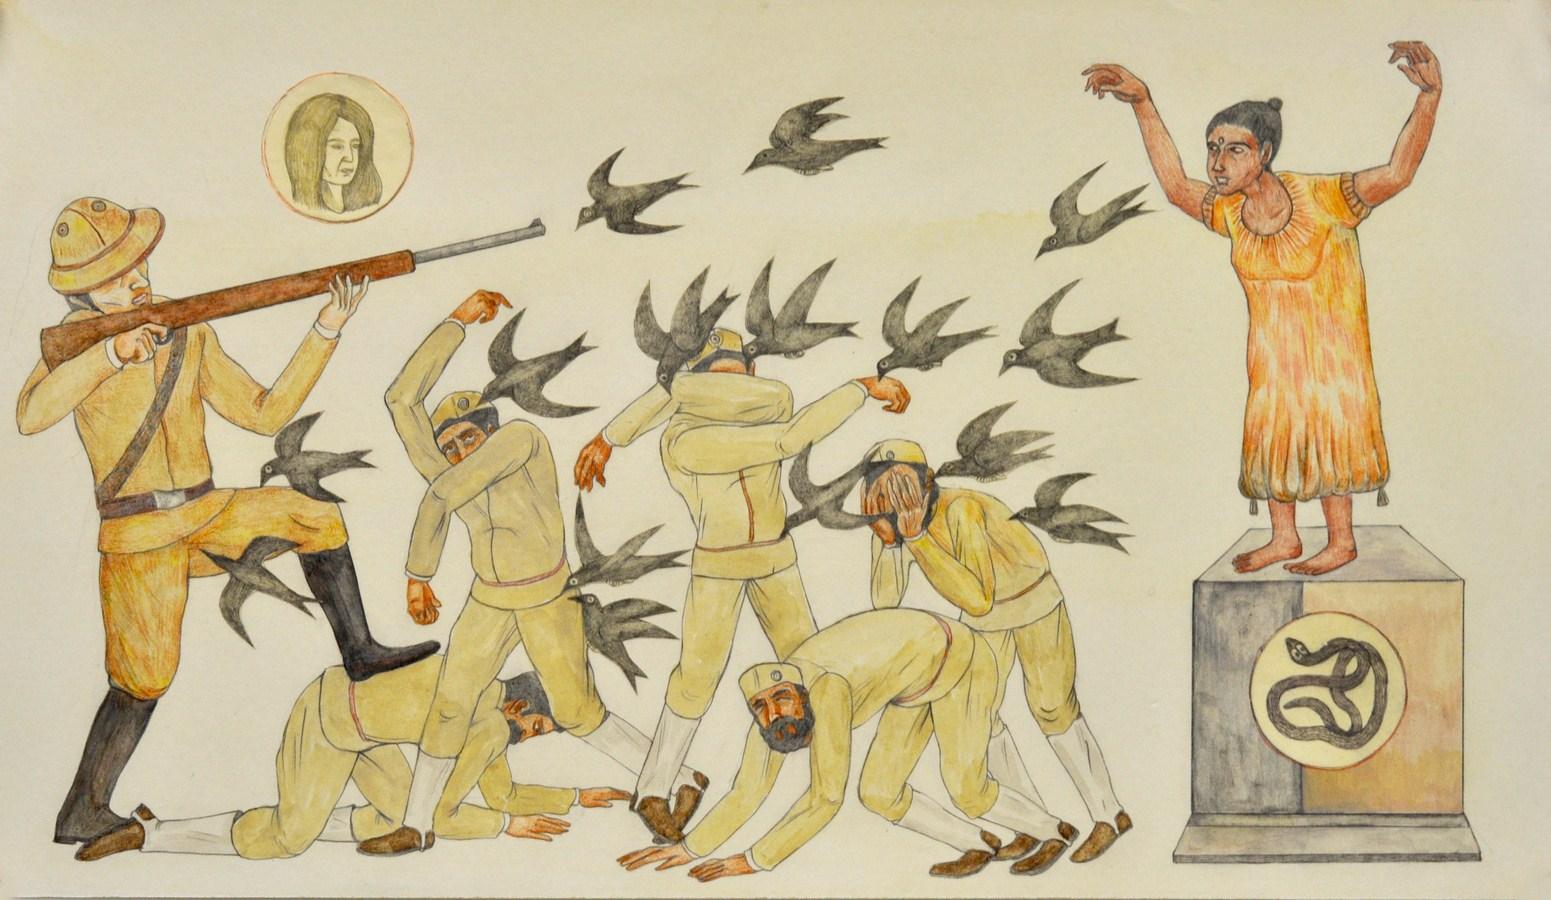 "Shrimanti Saha | Worshipper | Graphite,pencil colours, water colour, casein, collage on paper | 8"" x 14"" | 2017"